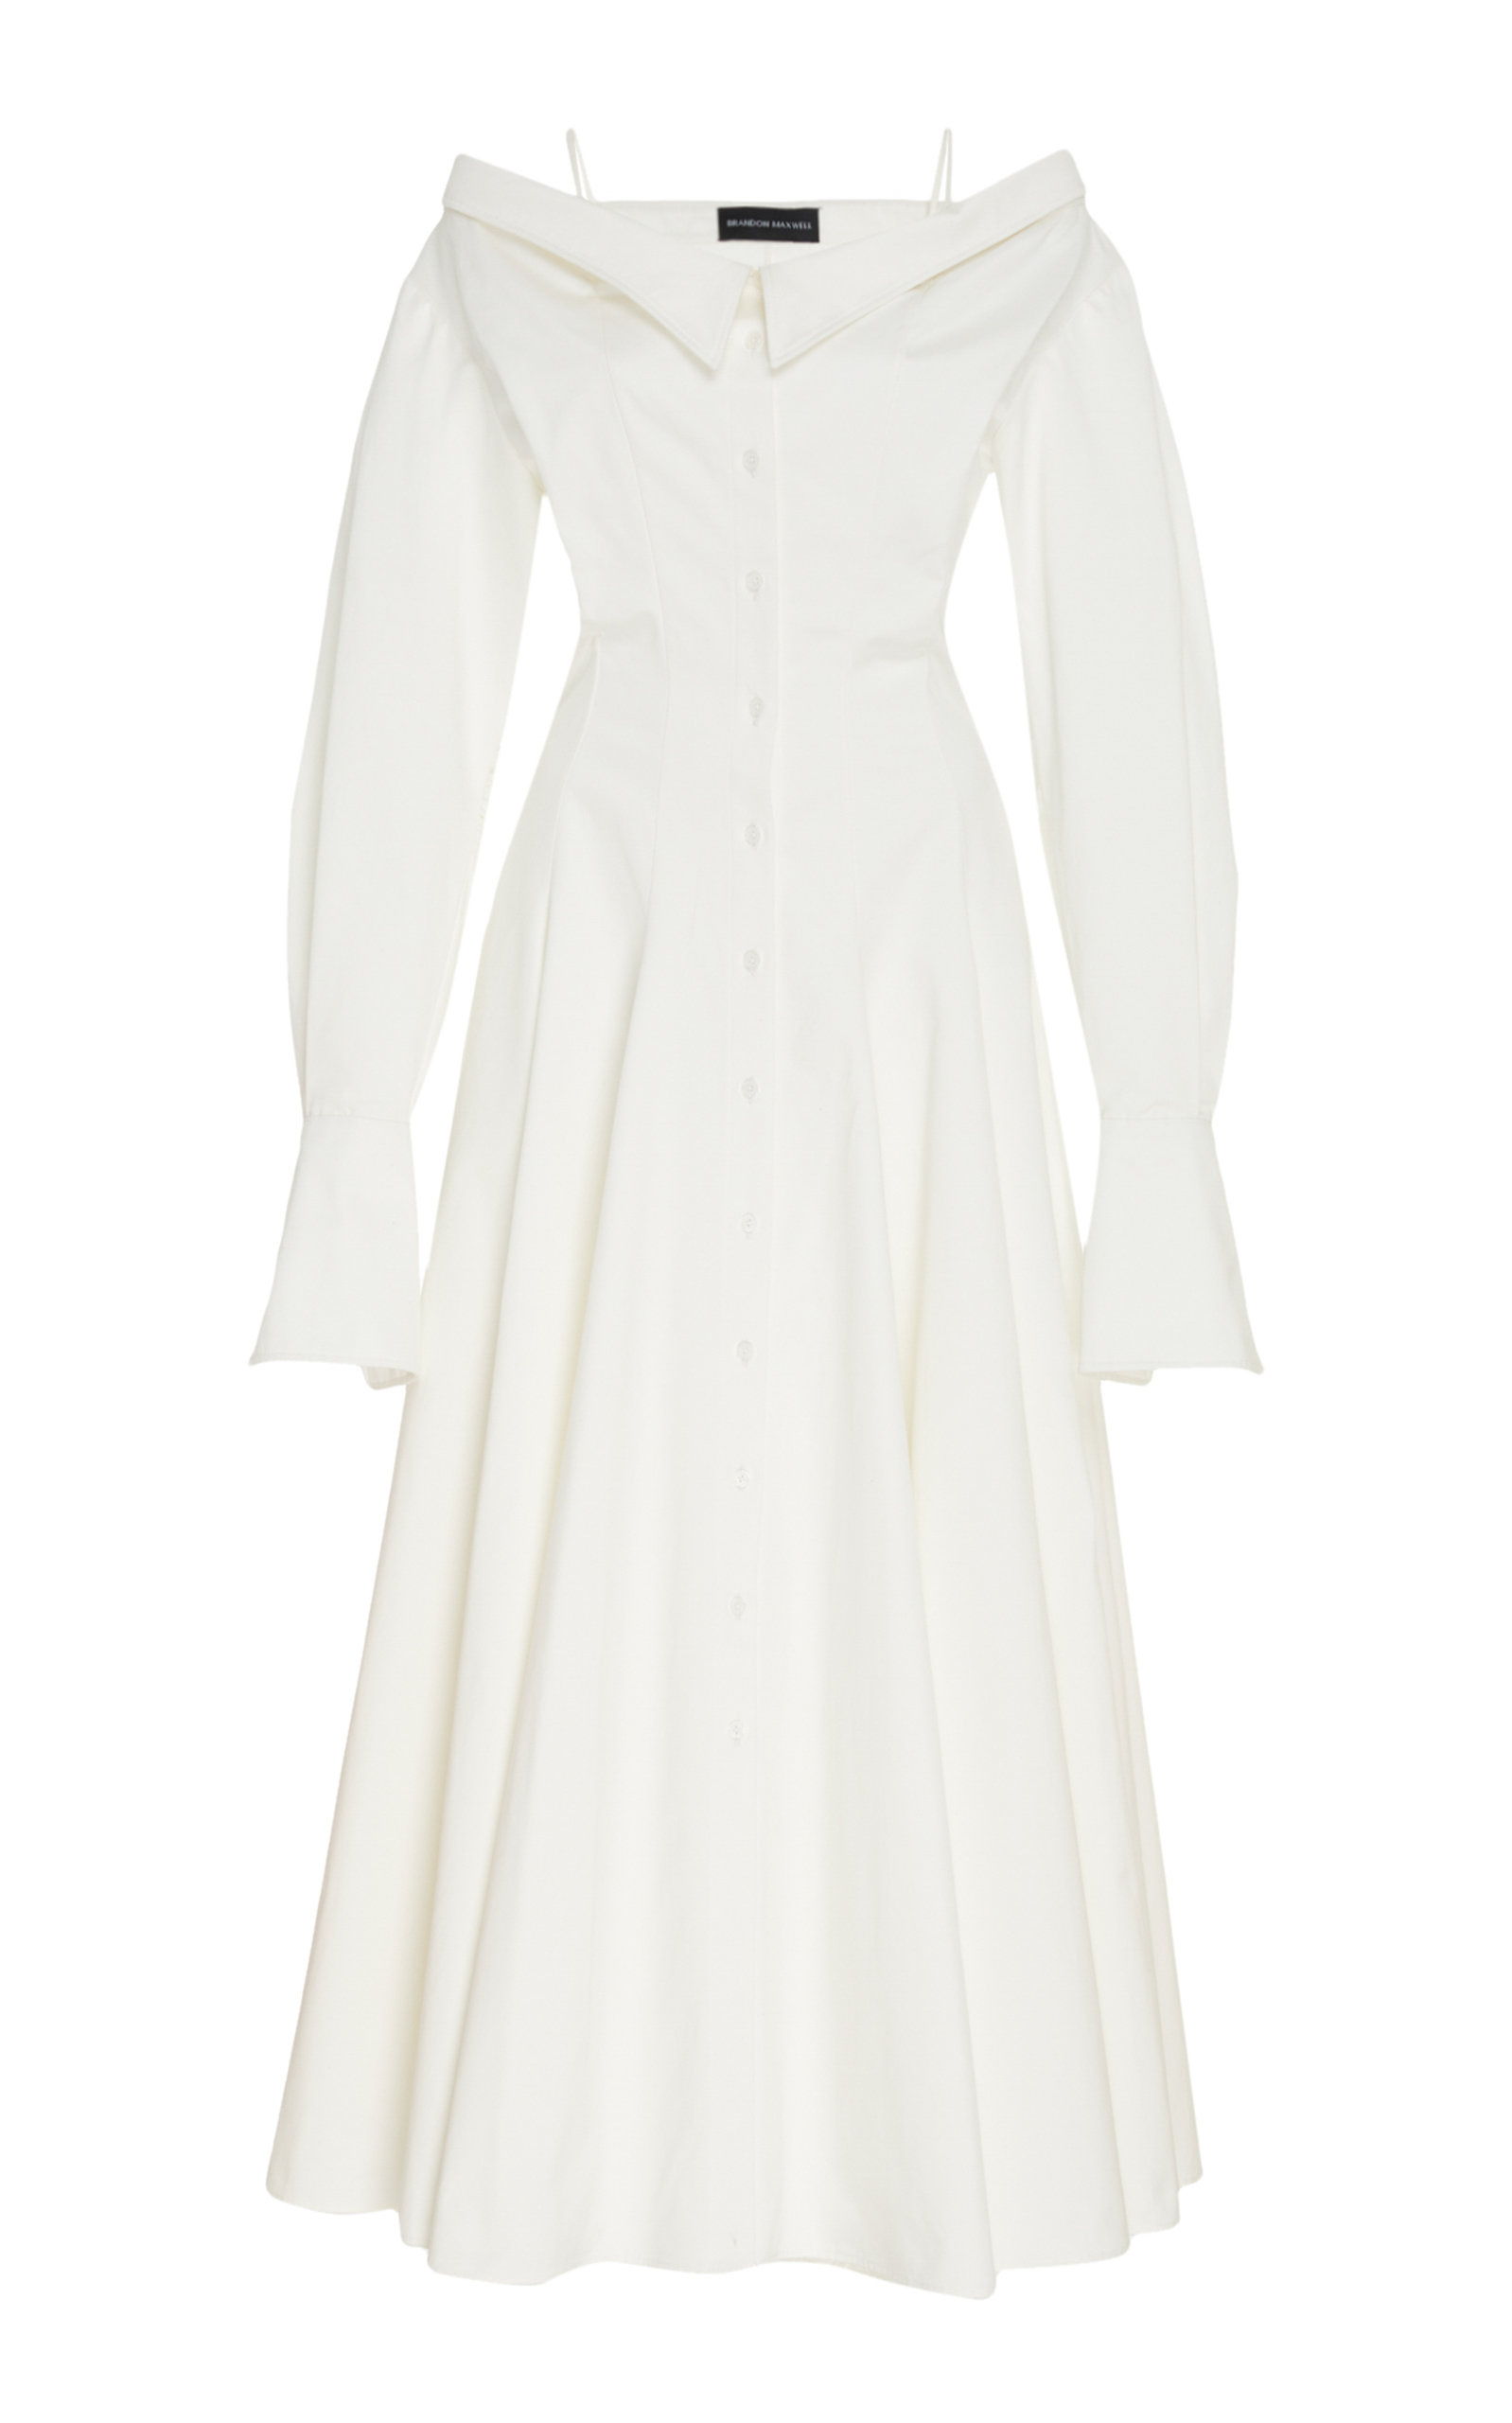 Buy Brandon Maxwell Off-The-Shoulder Cotton Midi Shirt Dress online, shop Brandon Maxwell at the best price